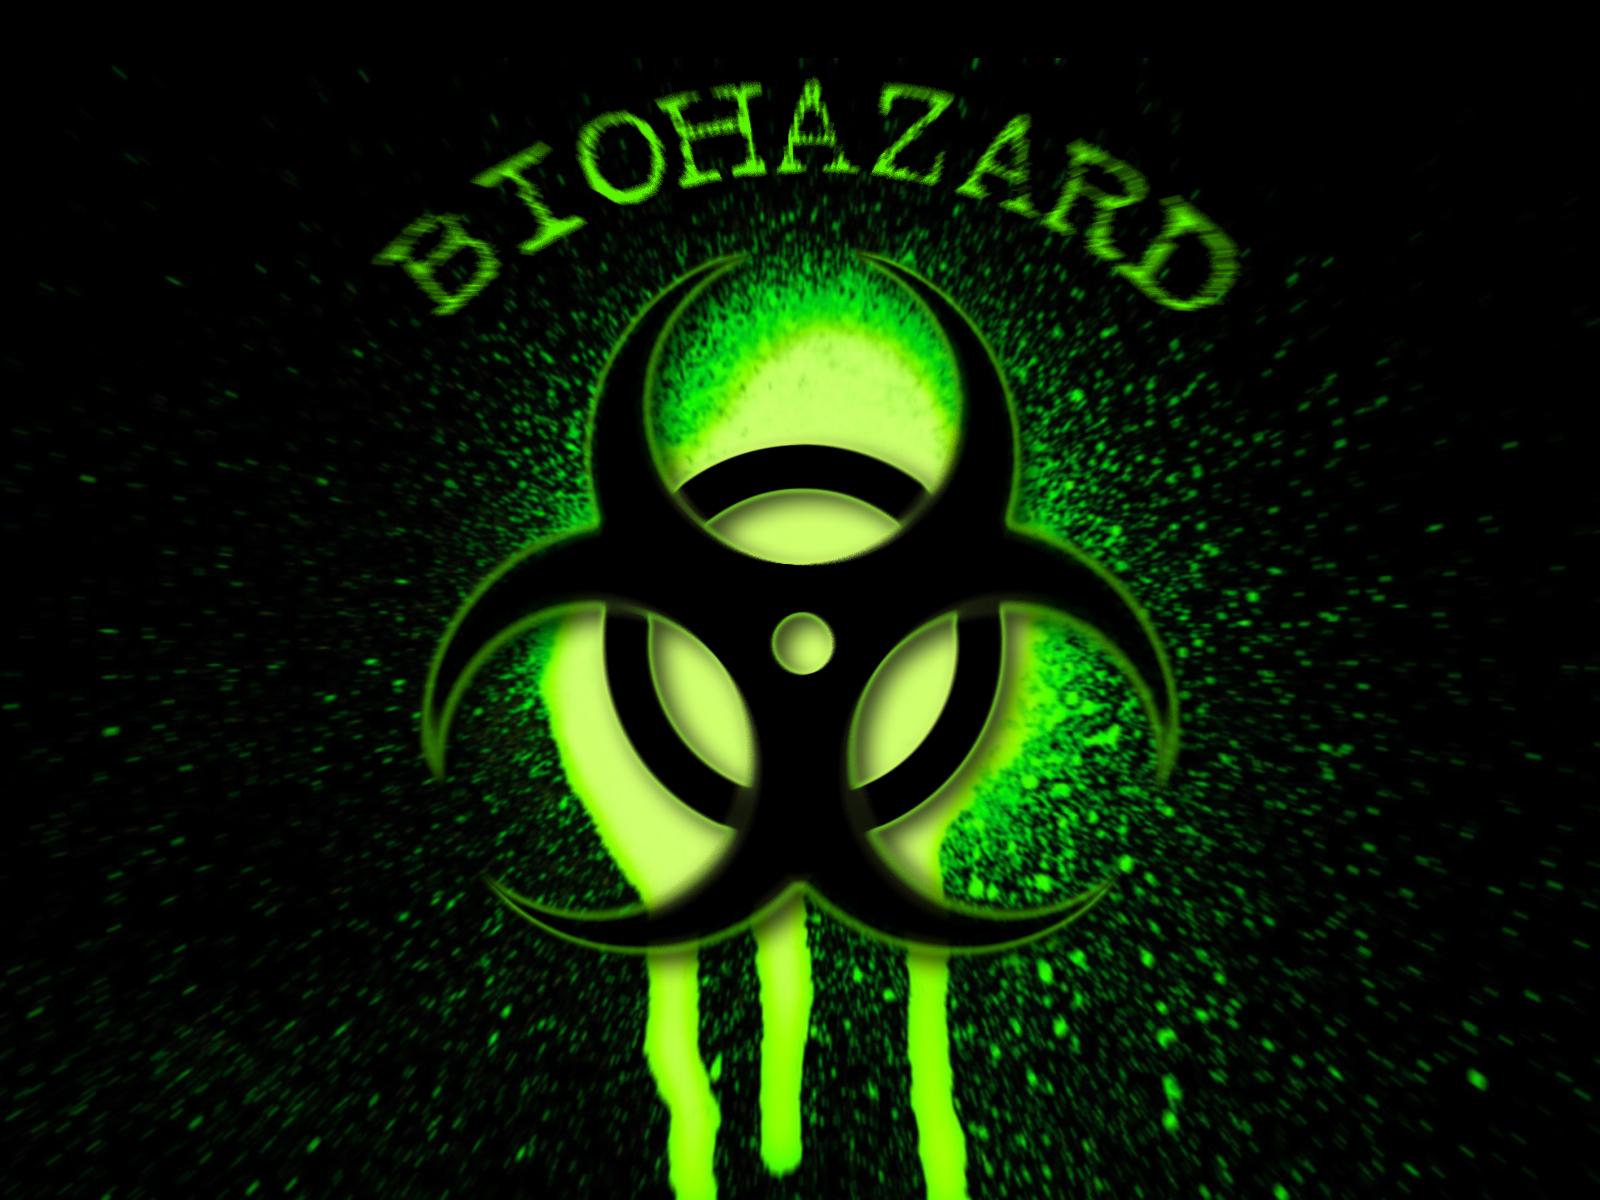 biohazard wallpaper 1600x1200 182827 wallpaperup